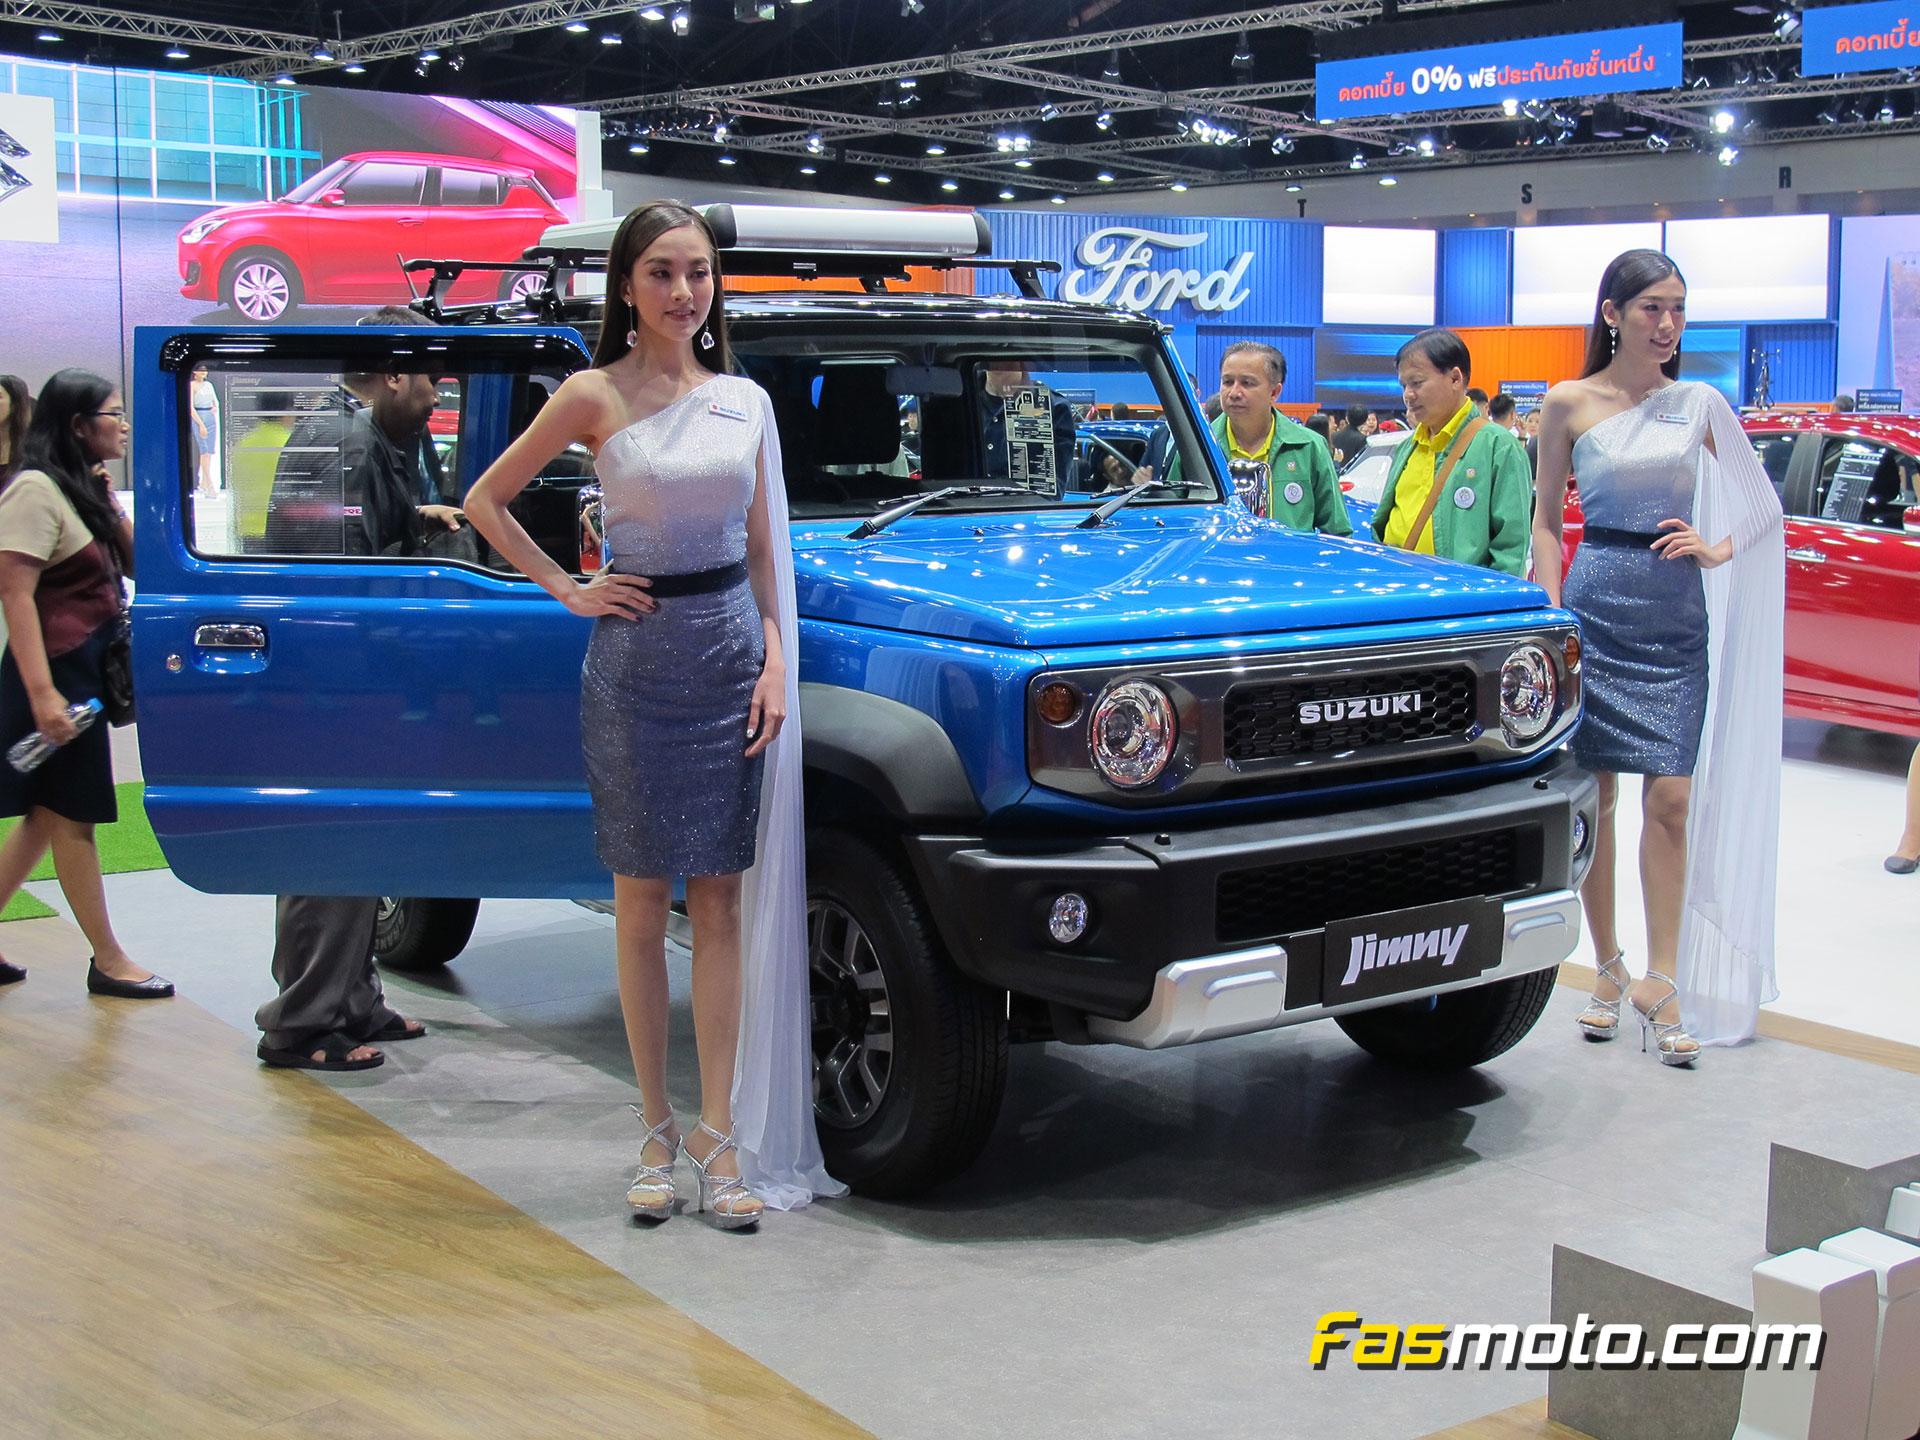 Suzuki Jimny with models